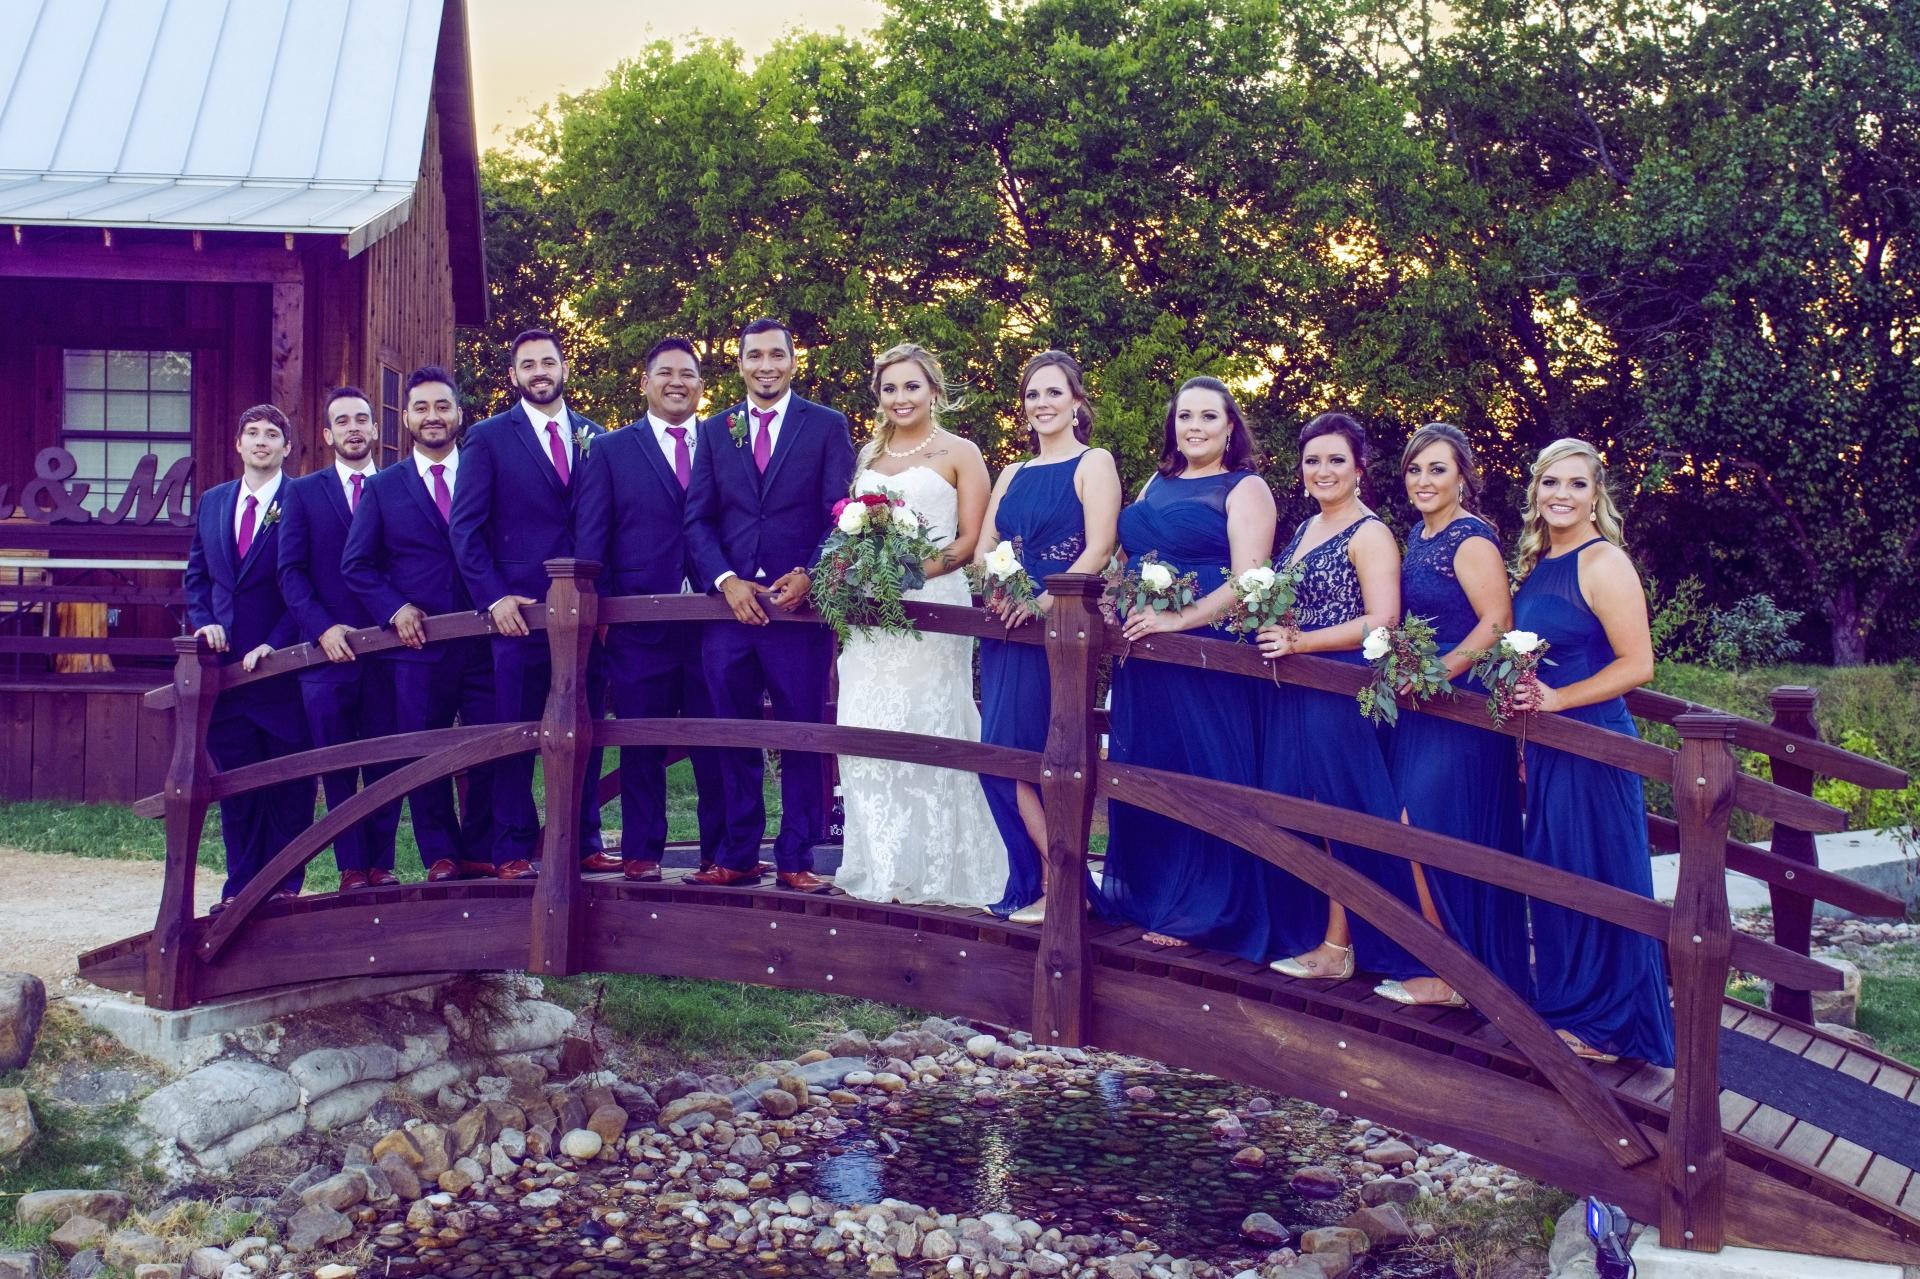 bridge cowboy west style farmer launch group wedding photo